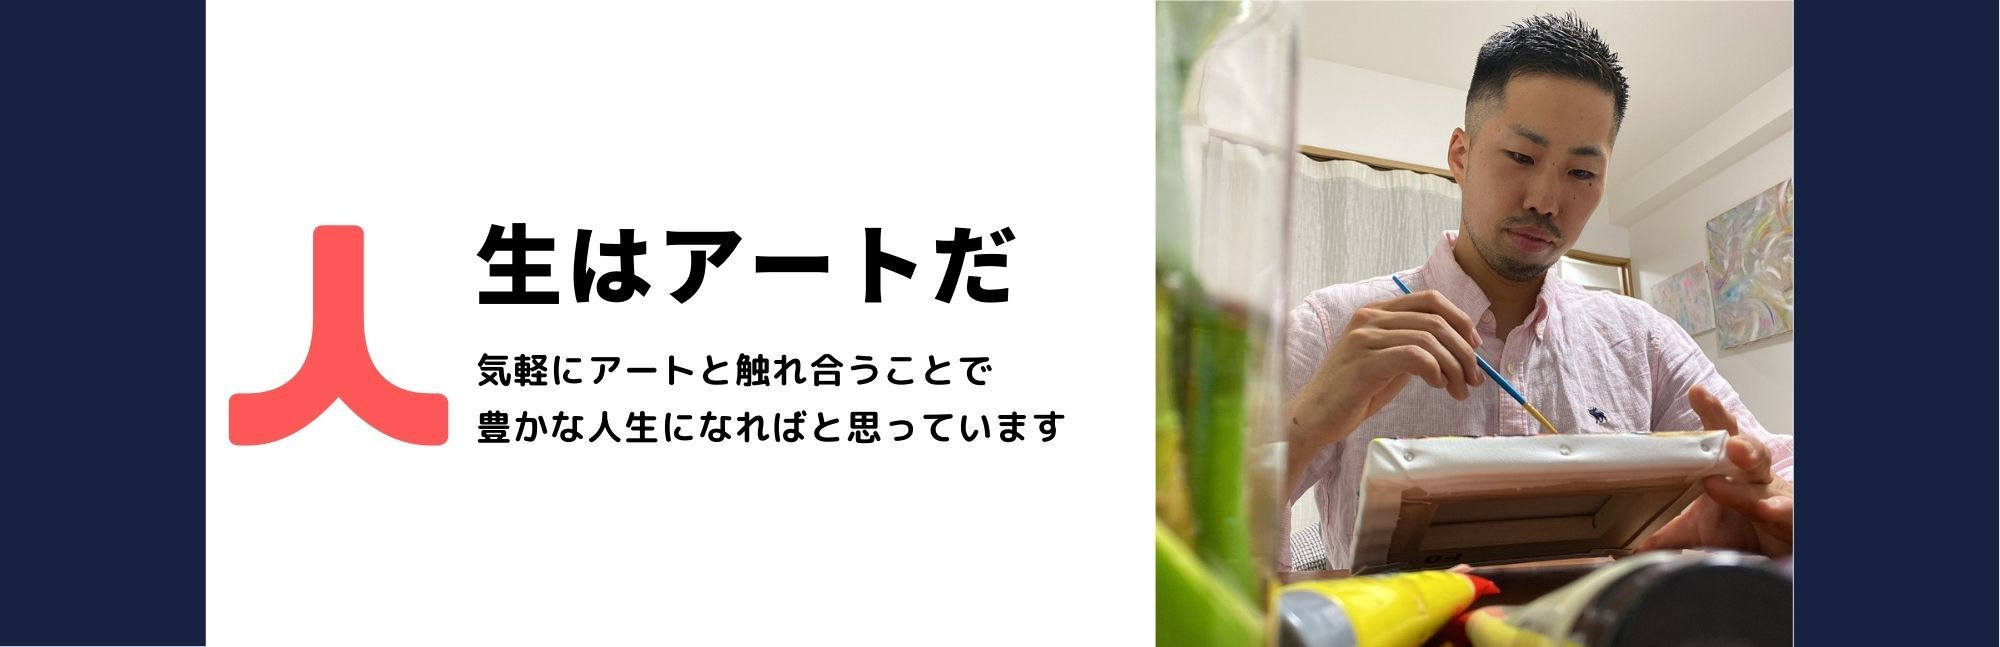 【アート&個性心理學】榊原慎也